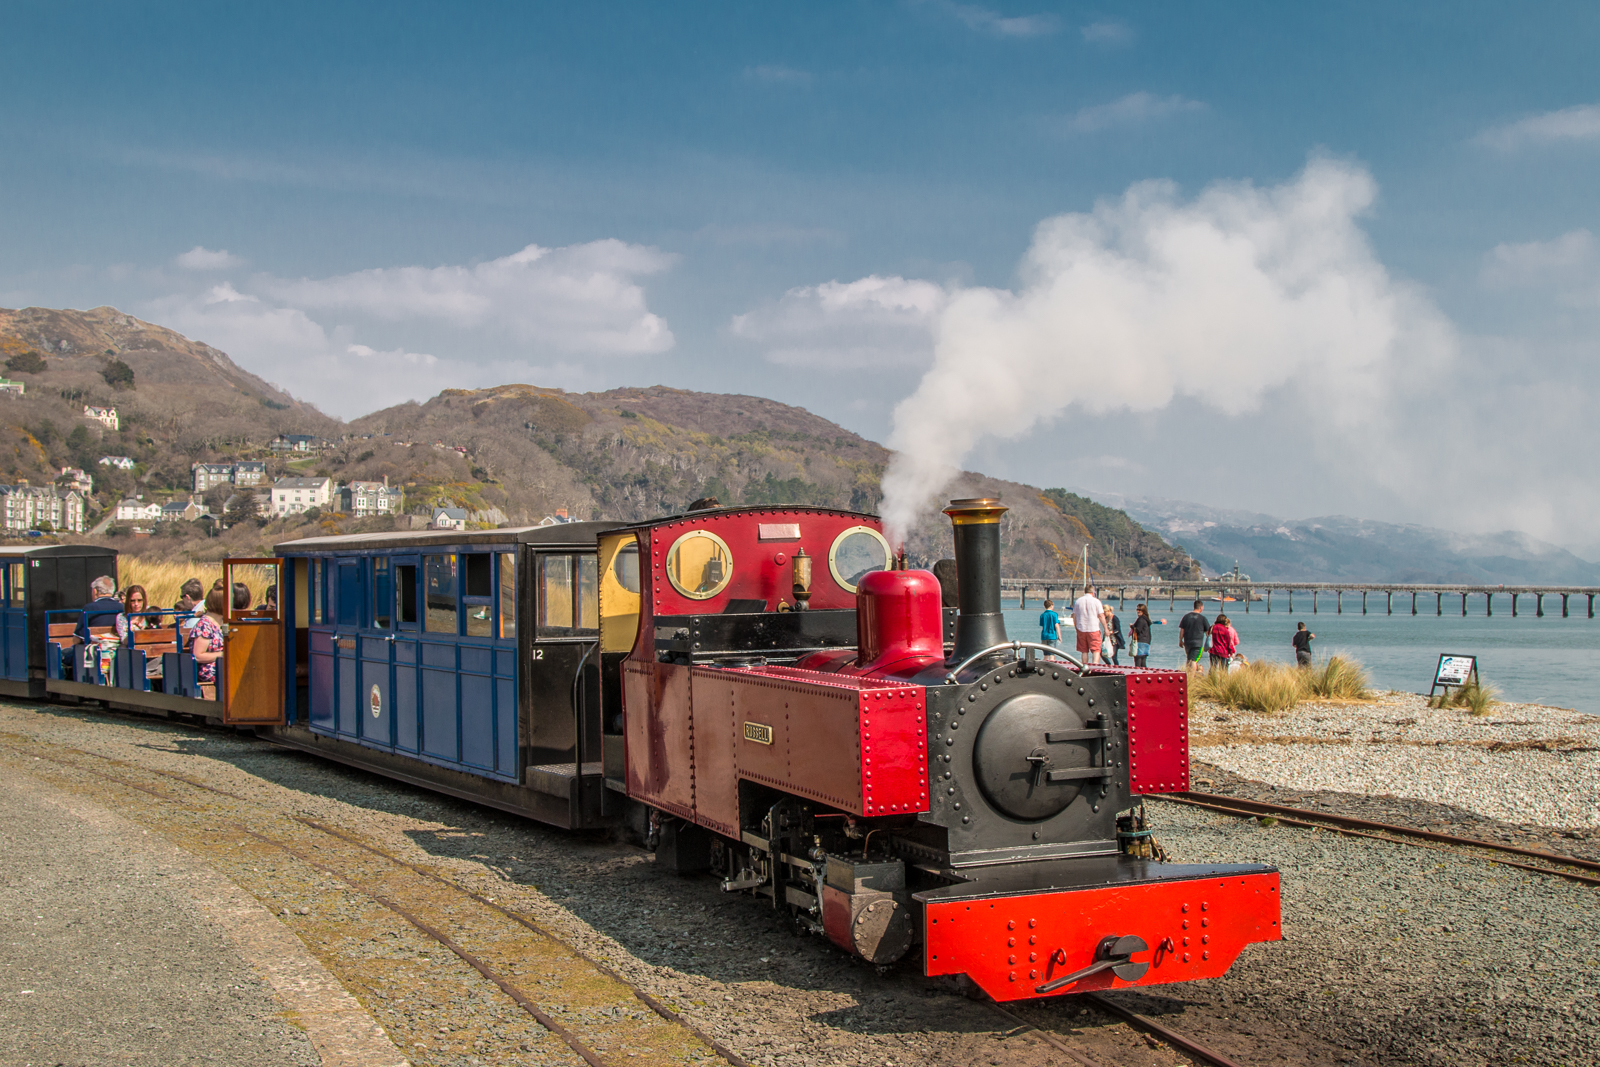 Fairbourne Railway. Photo: Barbara Fuller